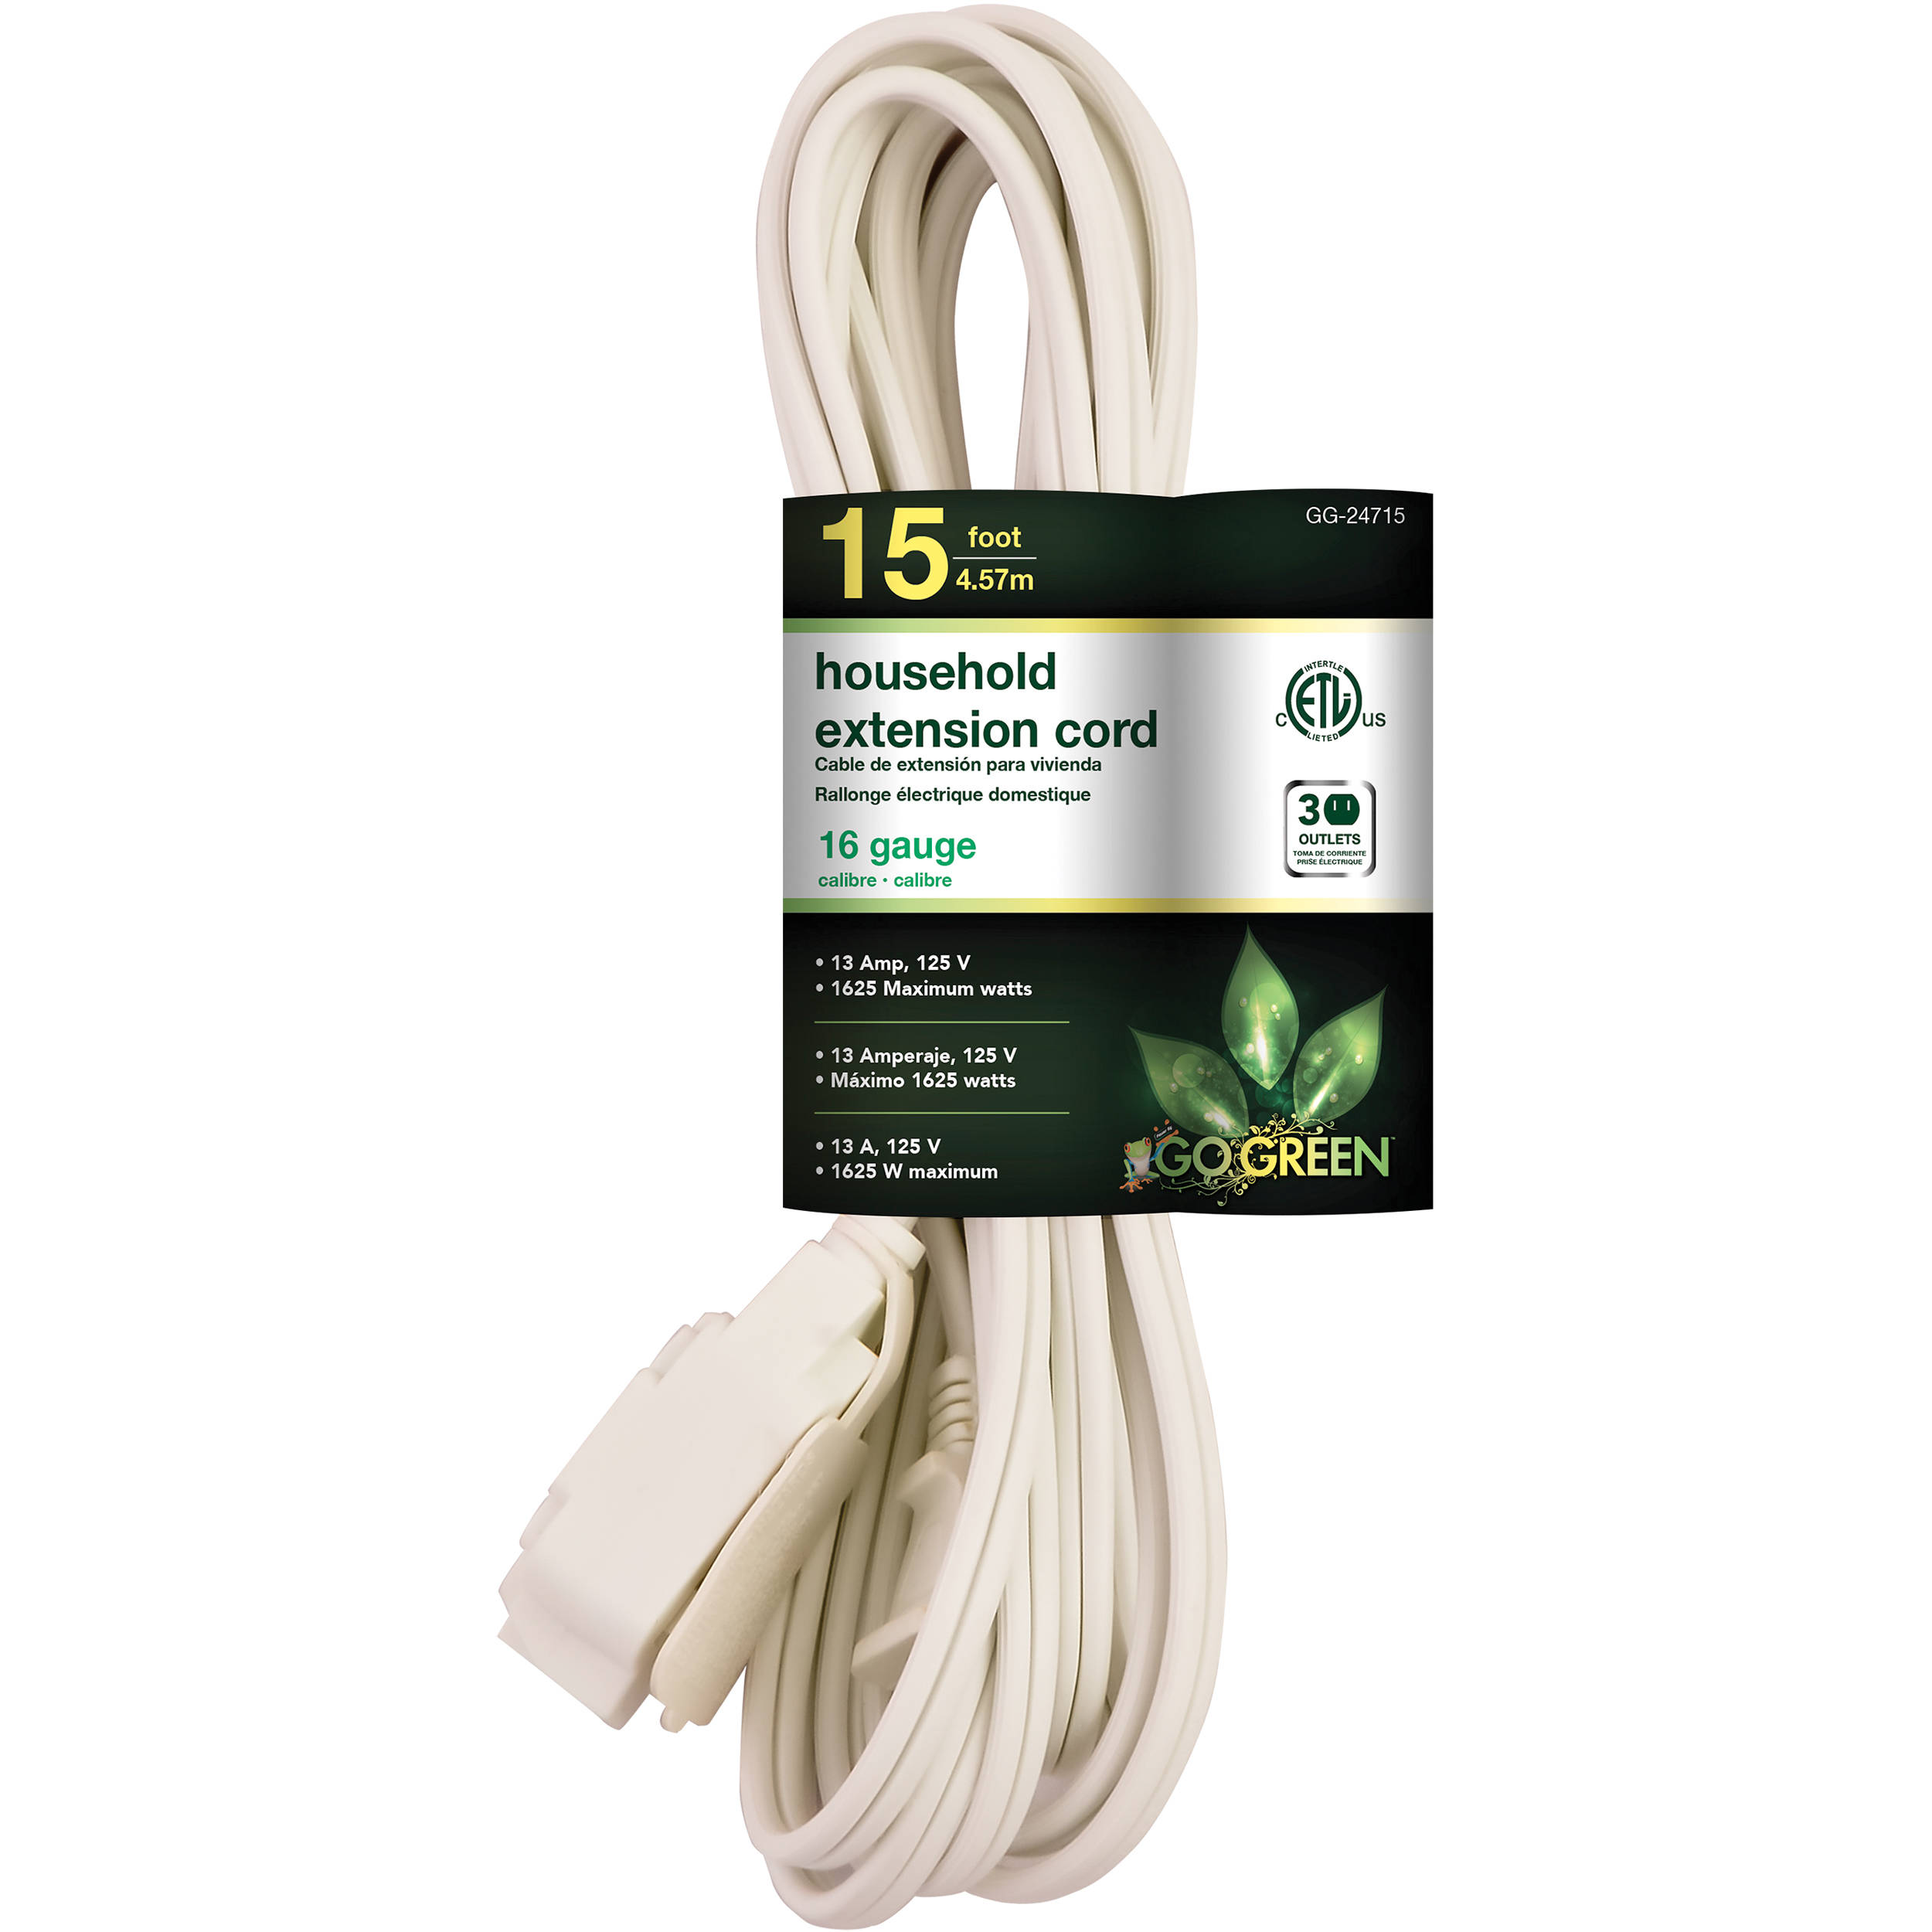 16 Gauge Extension Cord